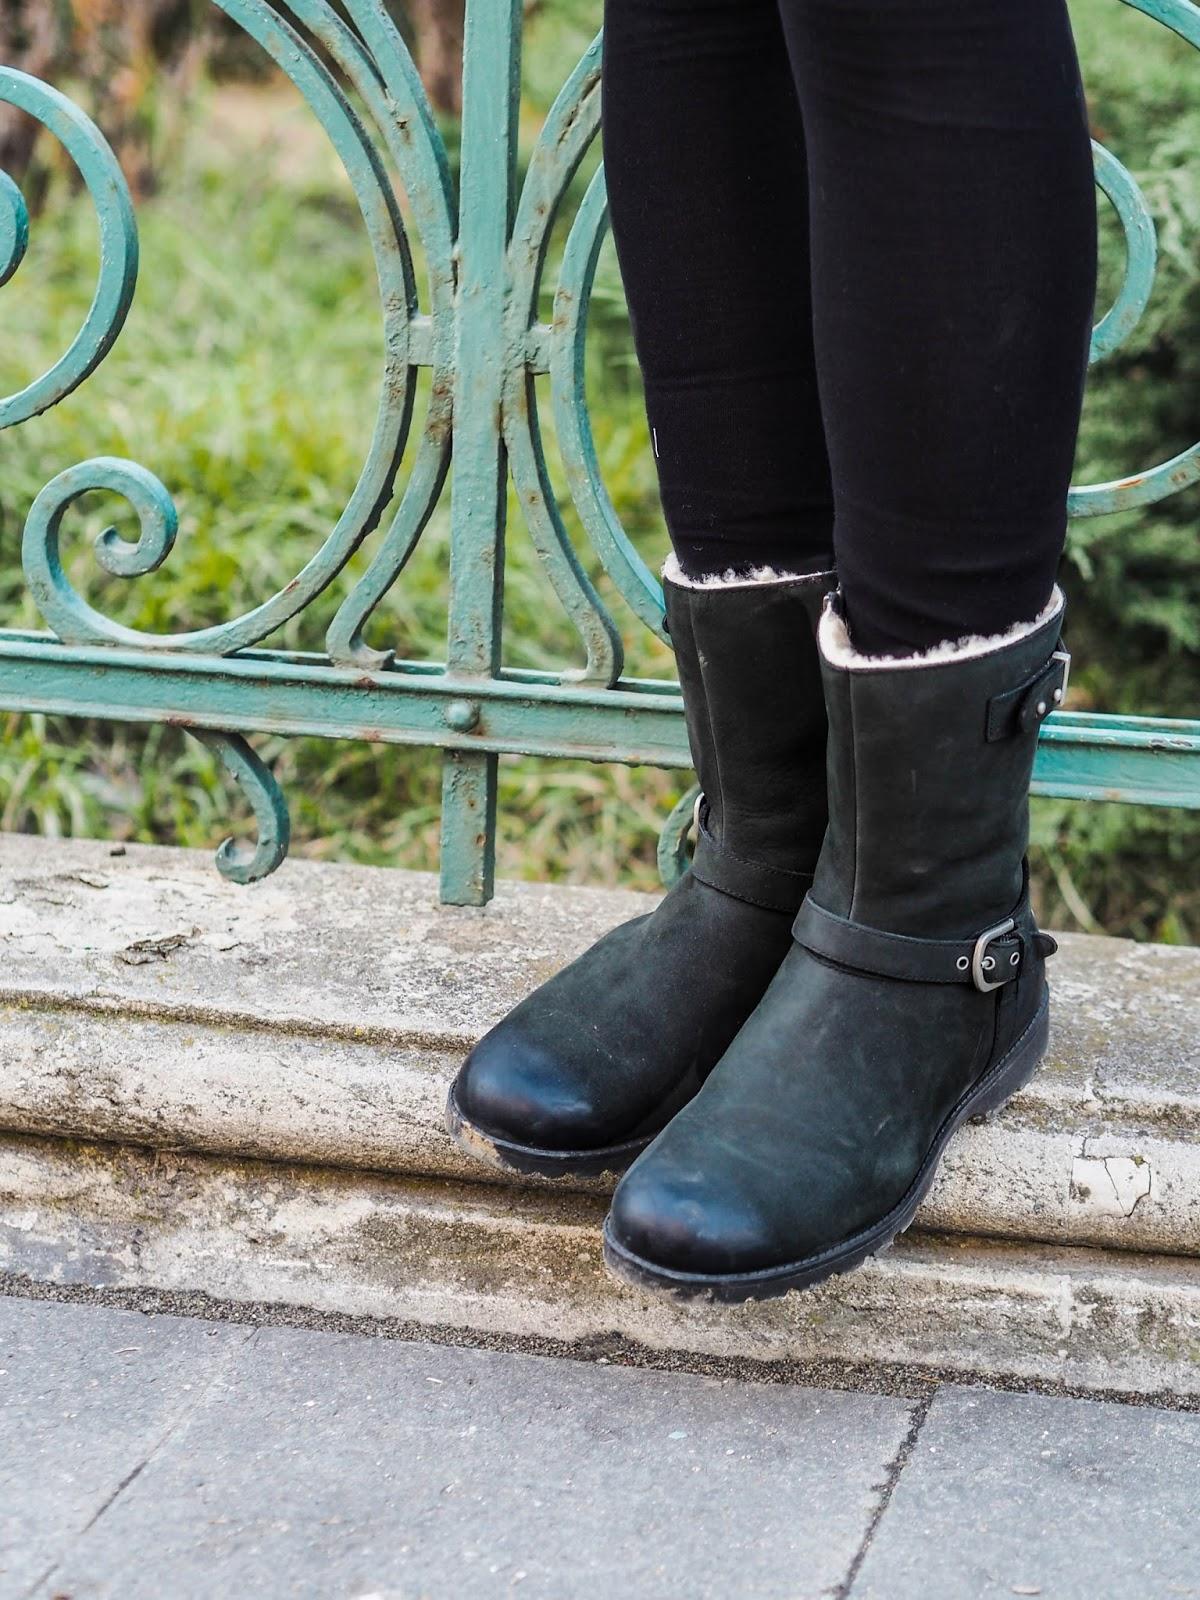 Black Ugg boots